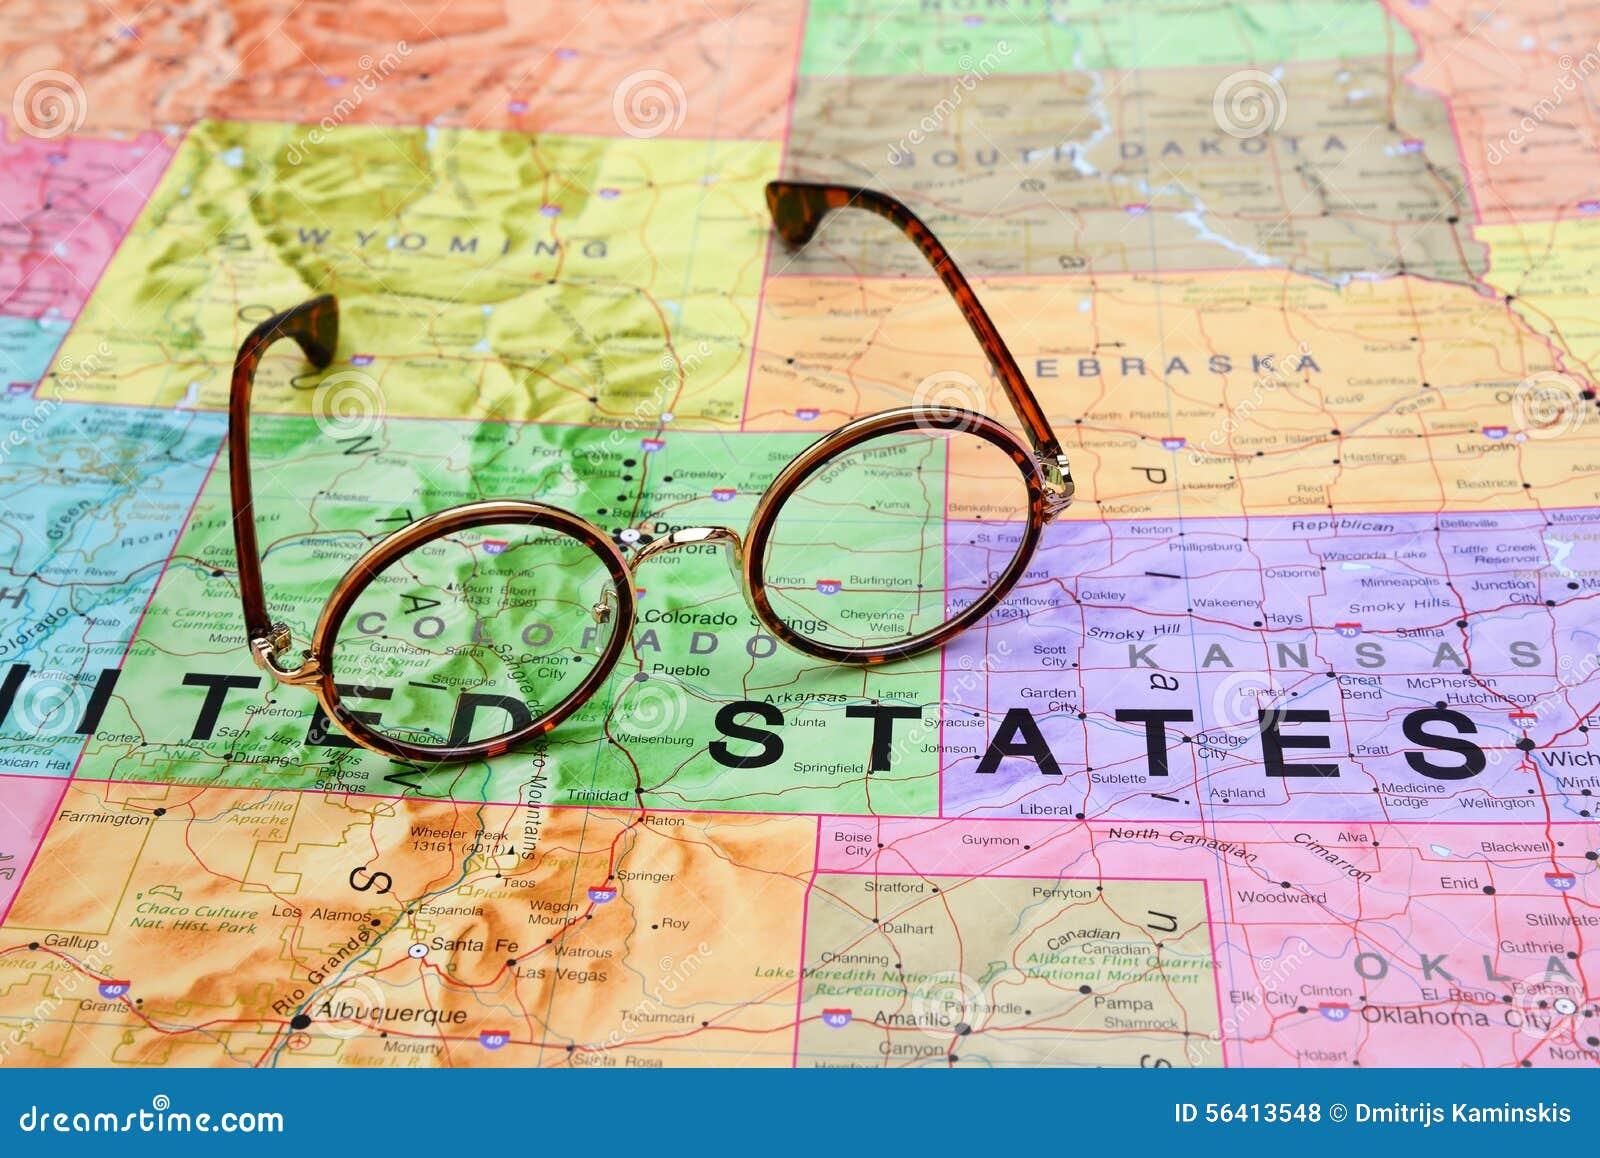 Colorado State On USA Map Colorado Flag And Map US States Card No - Colorado map usa